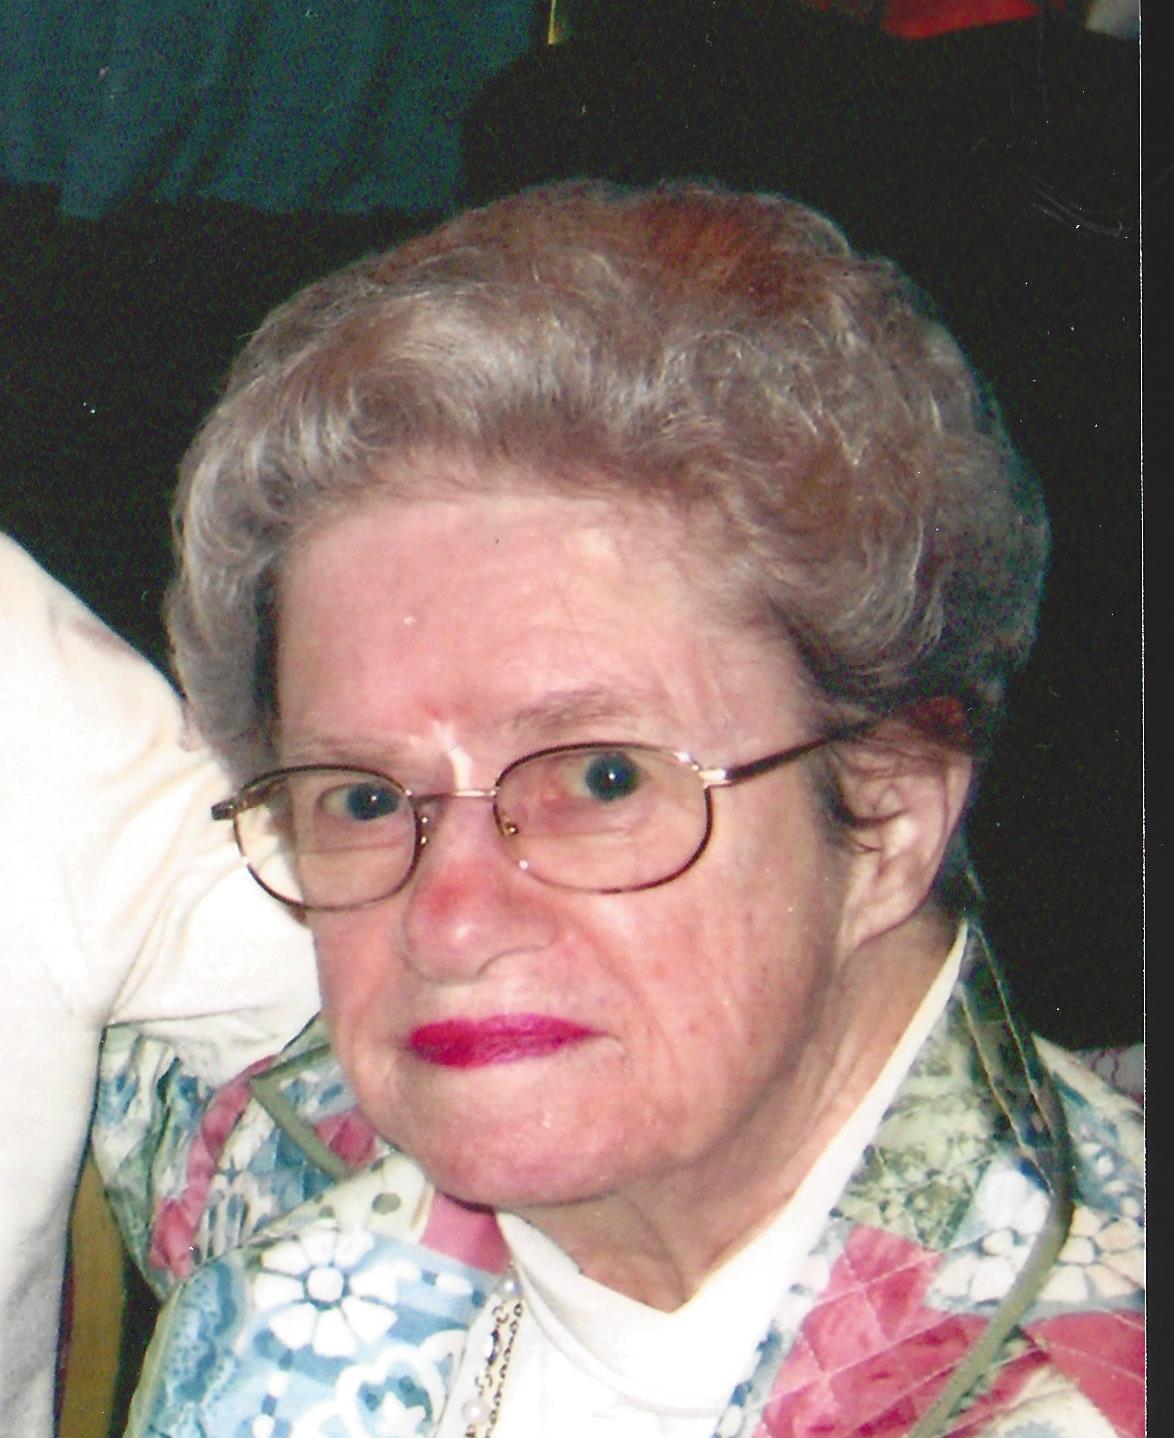 PATRICIA ROSE SCANLON